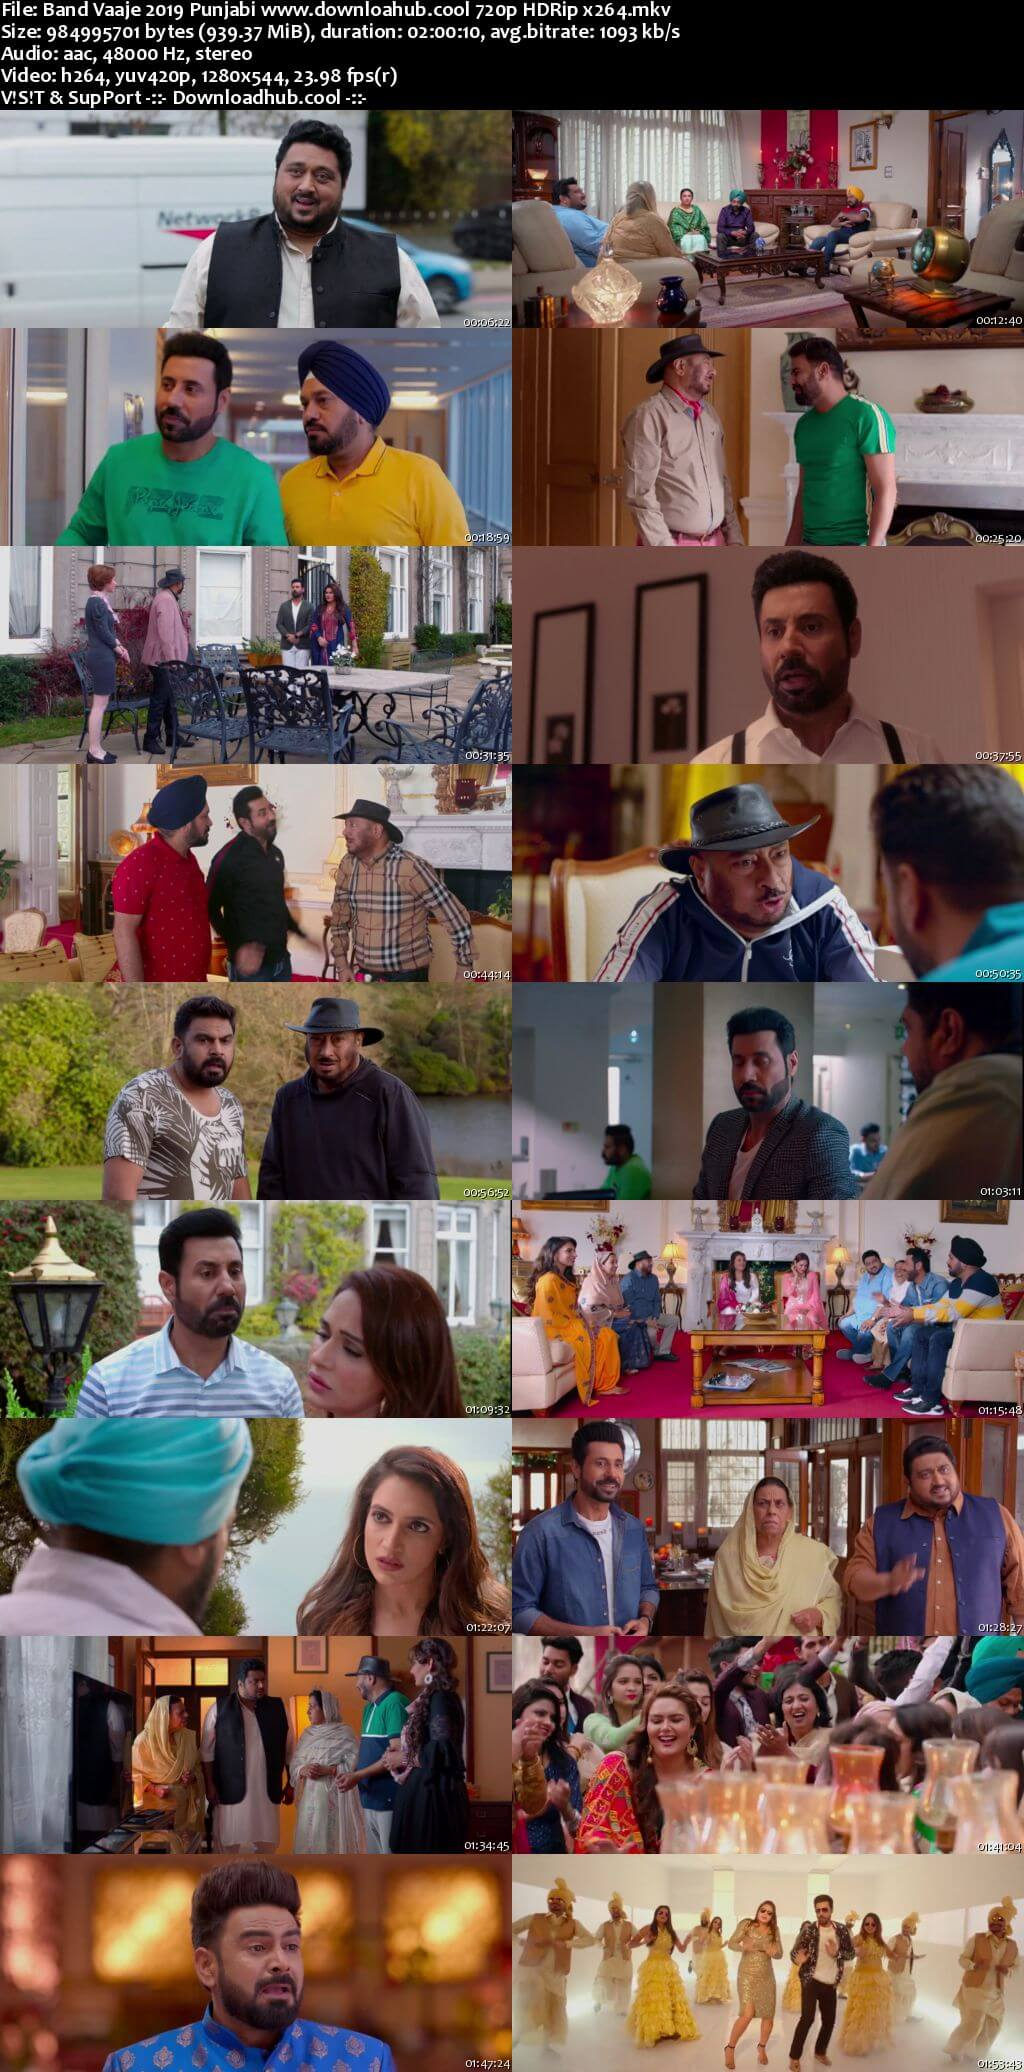 Band Vaaje 2019 Punjabi 720p HDRip x264